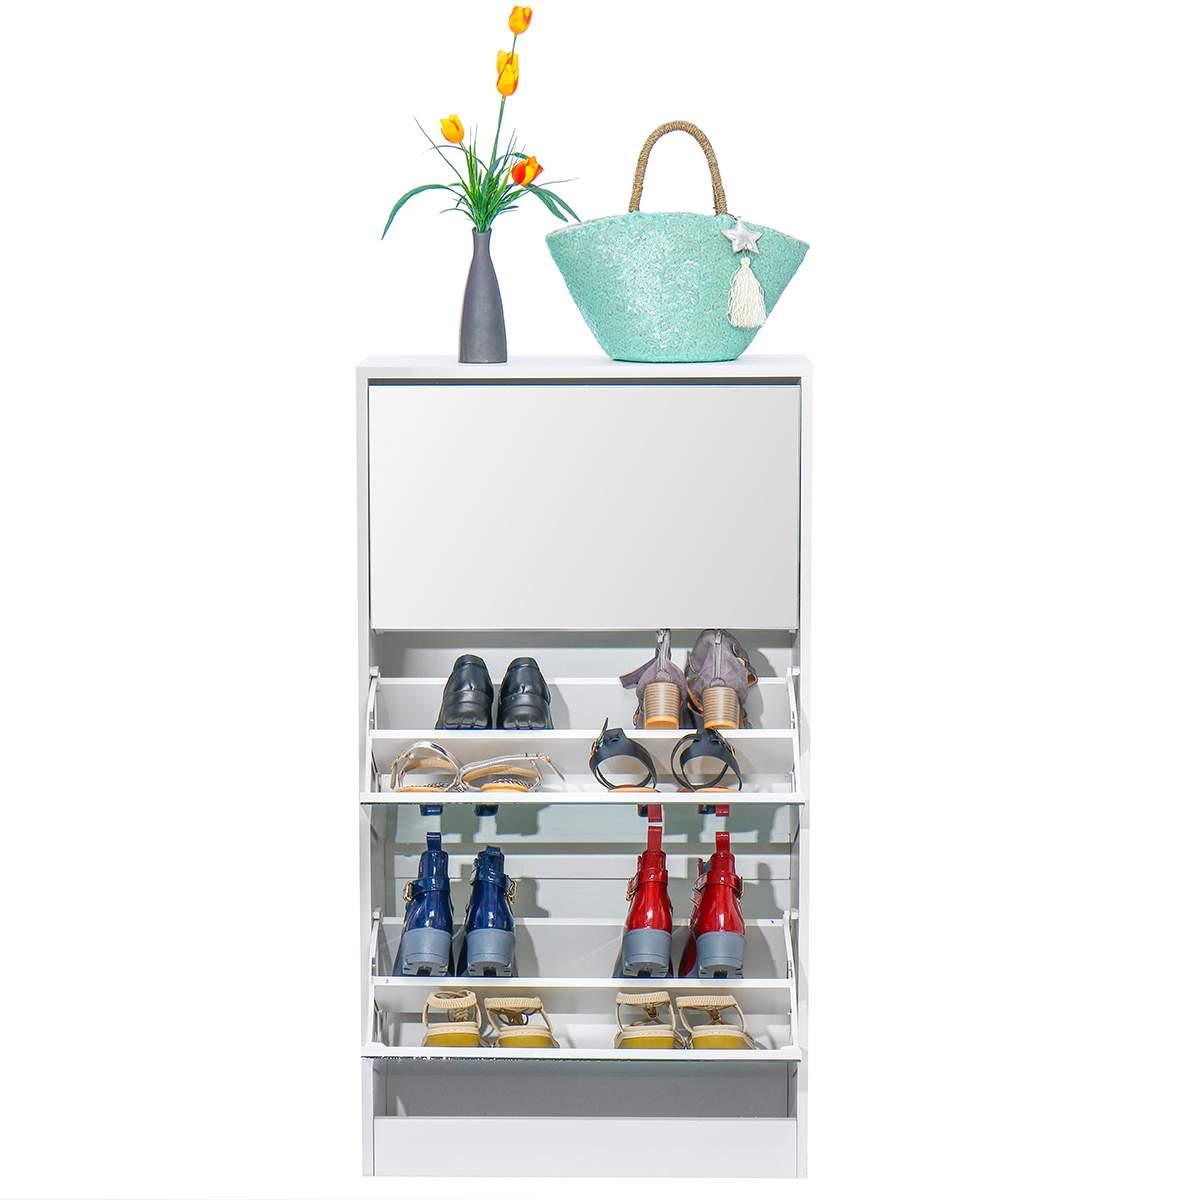 Flip Bucket Shoe Simple Home Space Multi-Layer Door Dustproof Porch Solid Wood Shoe Rack Shoes Cabinet Mirror